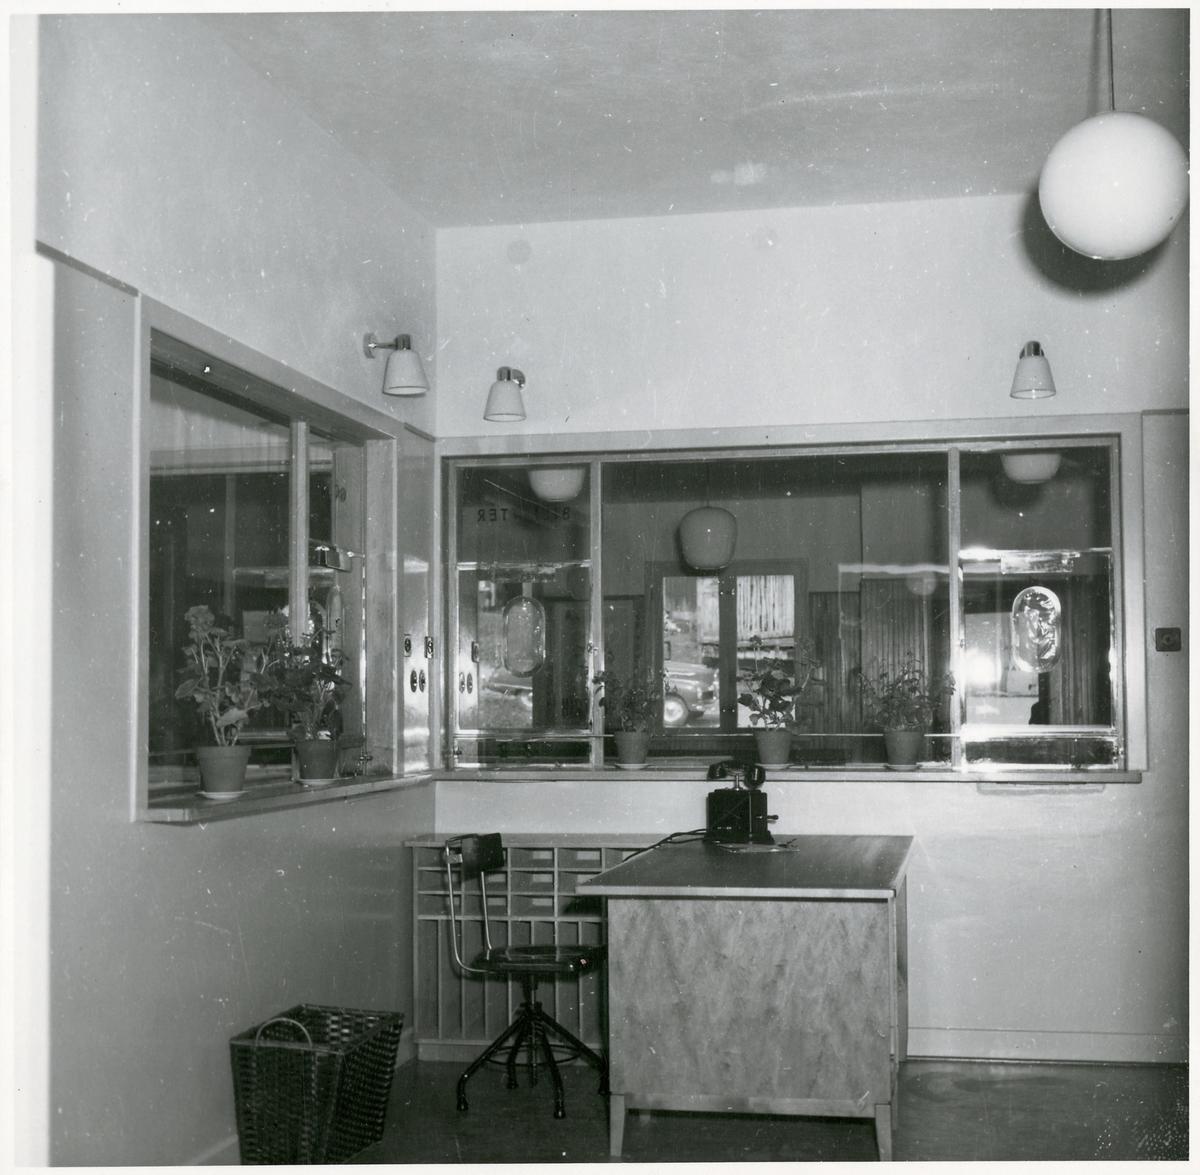 Biljettkontor, Funäsdalens busstation.